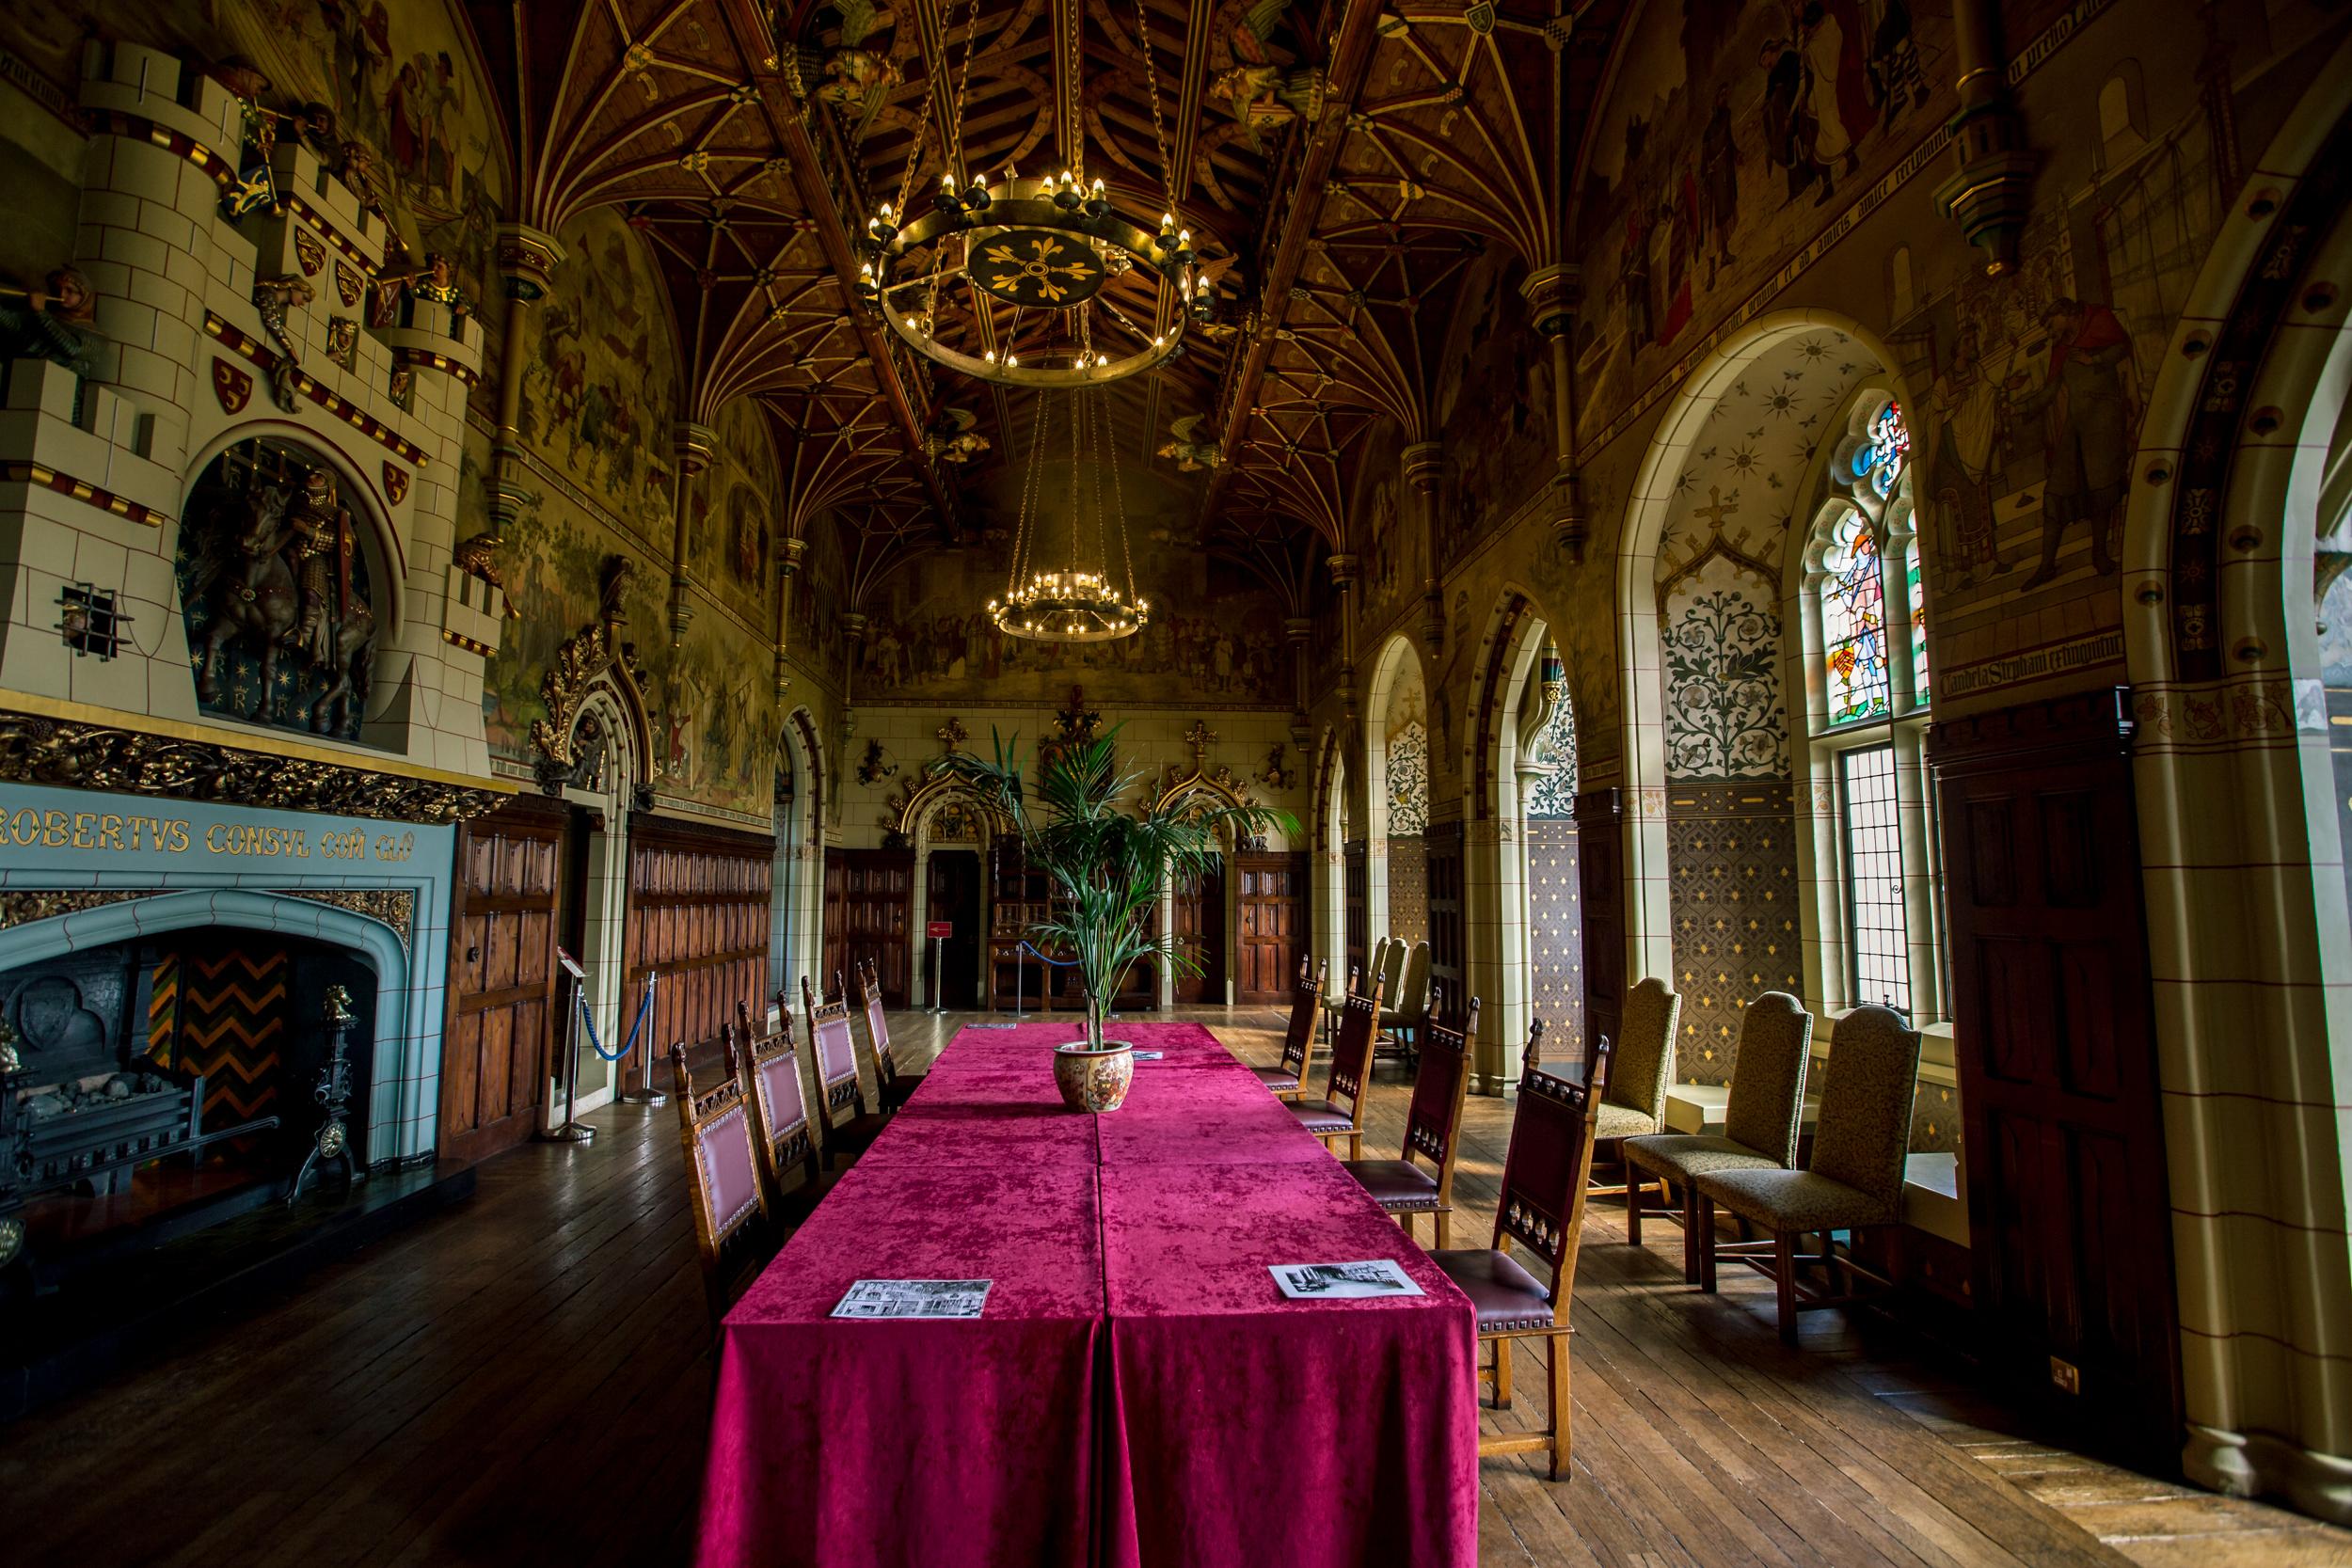 cardiff castle interior hall